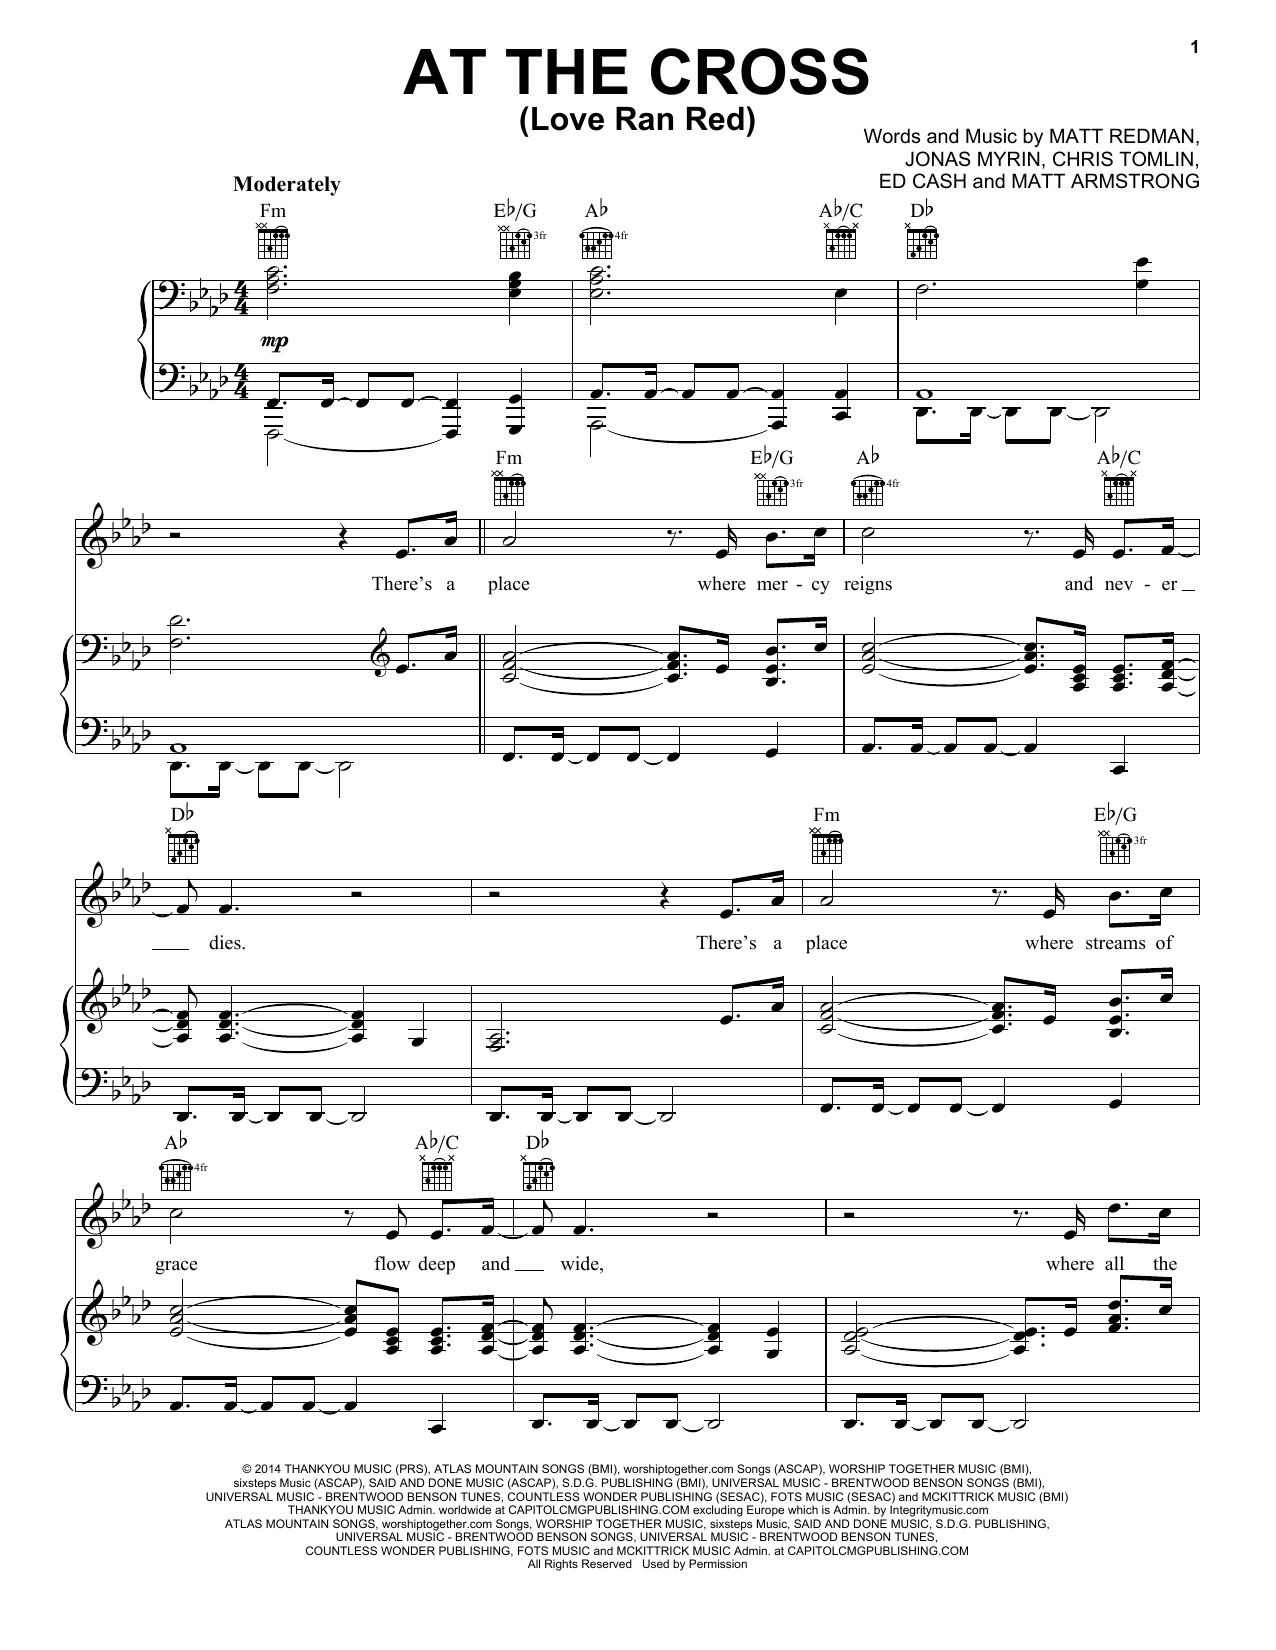 Chris Tomlin At The Cross Love Ran Red Sheet Music Notes Chords